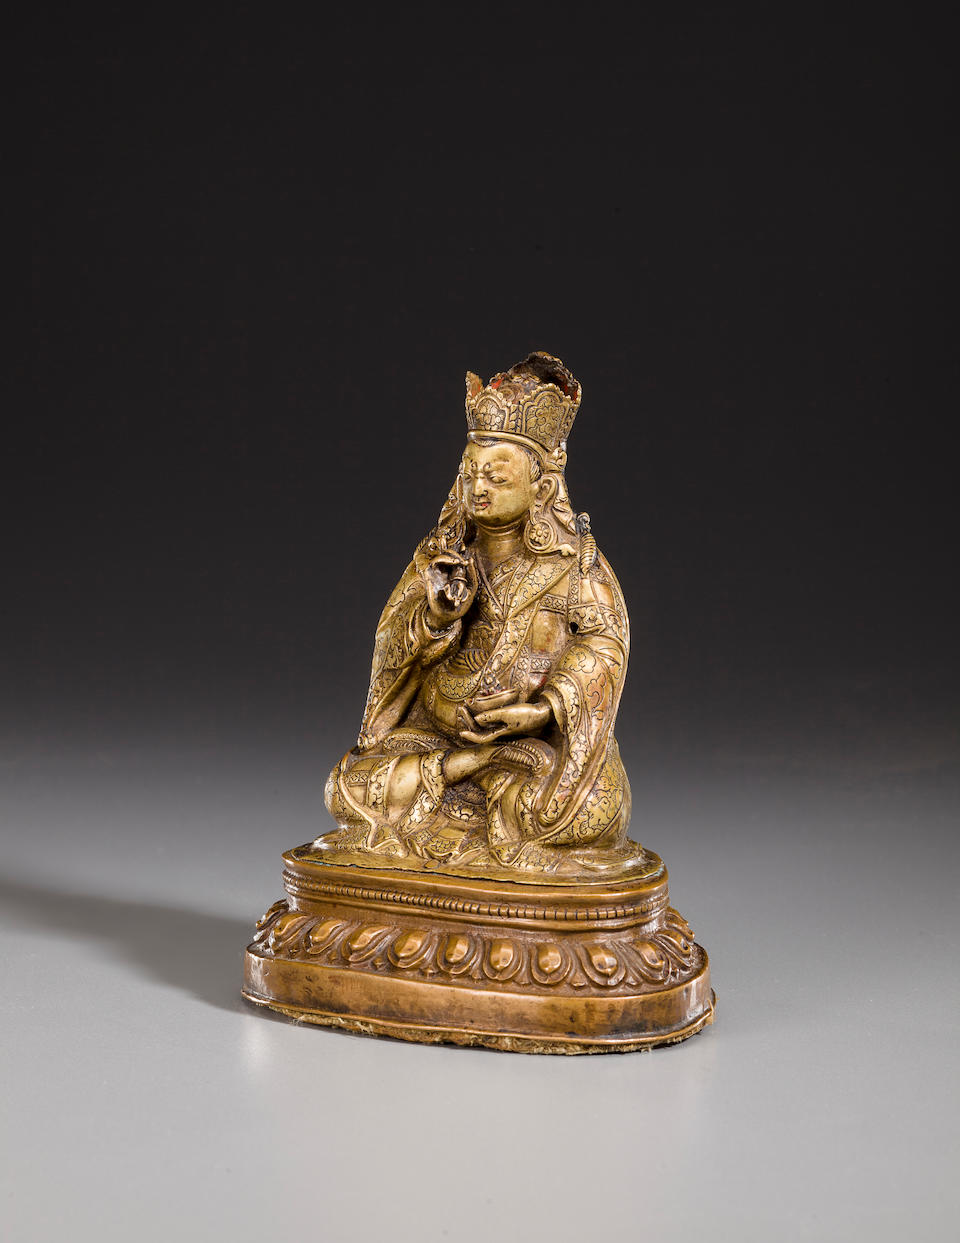 A copper and copper alloy repoussé figure of Padmasambhava  Tibet, 15th century